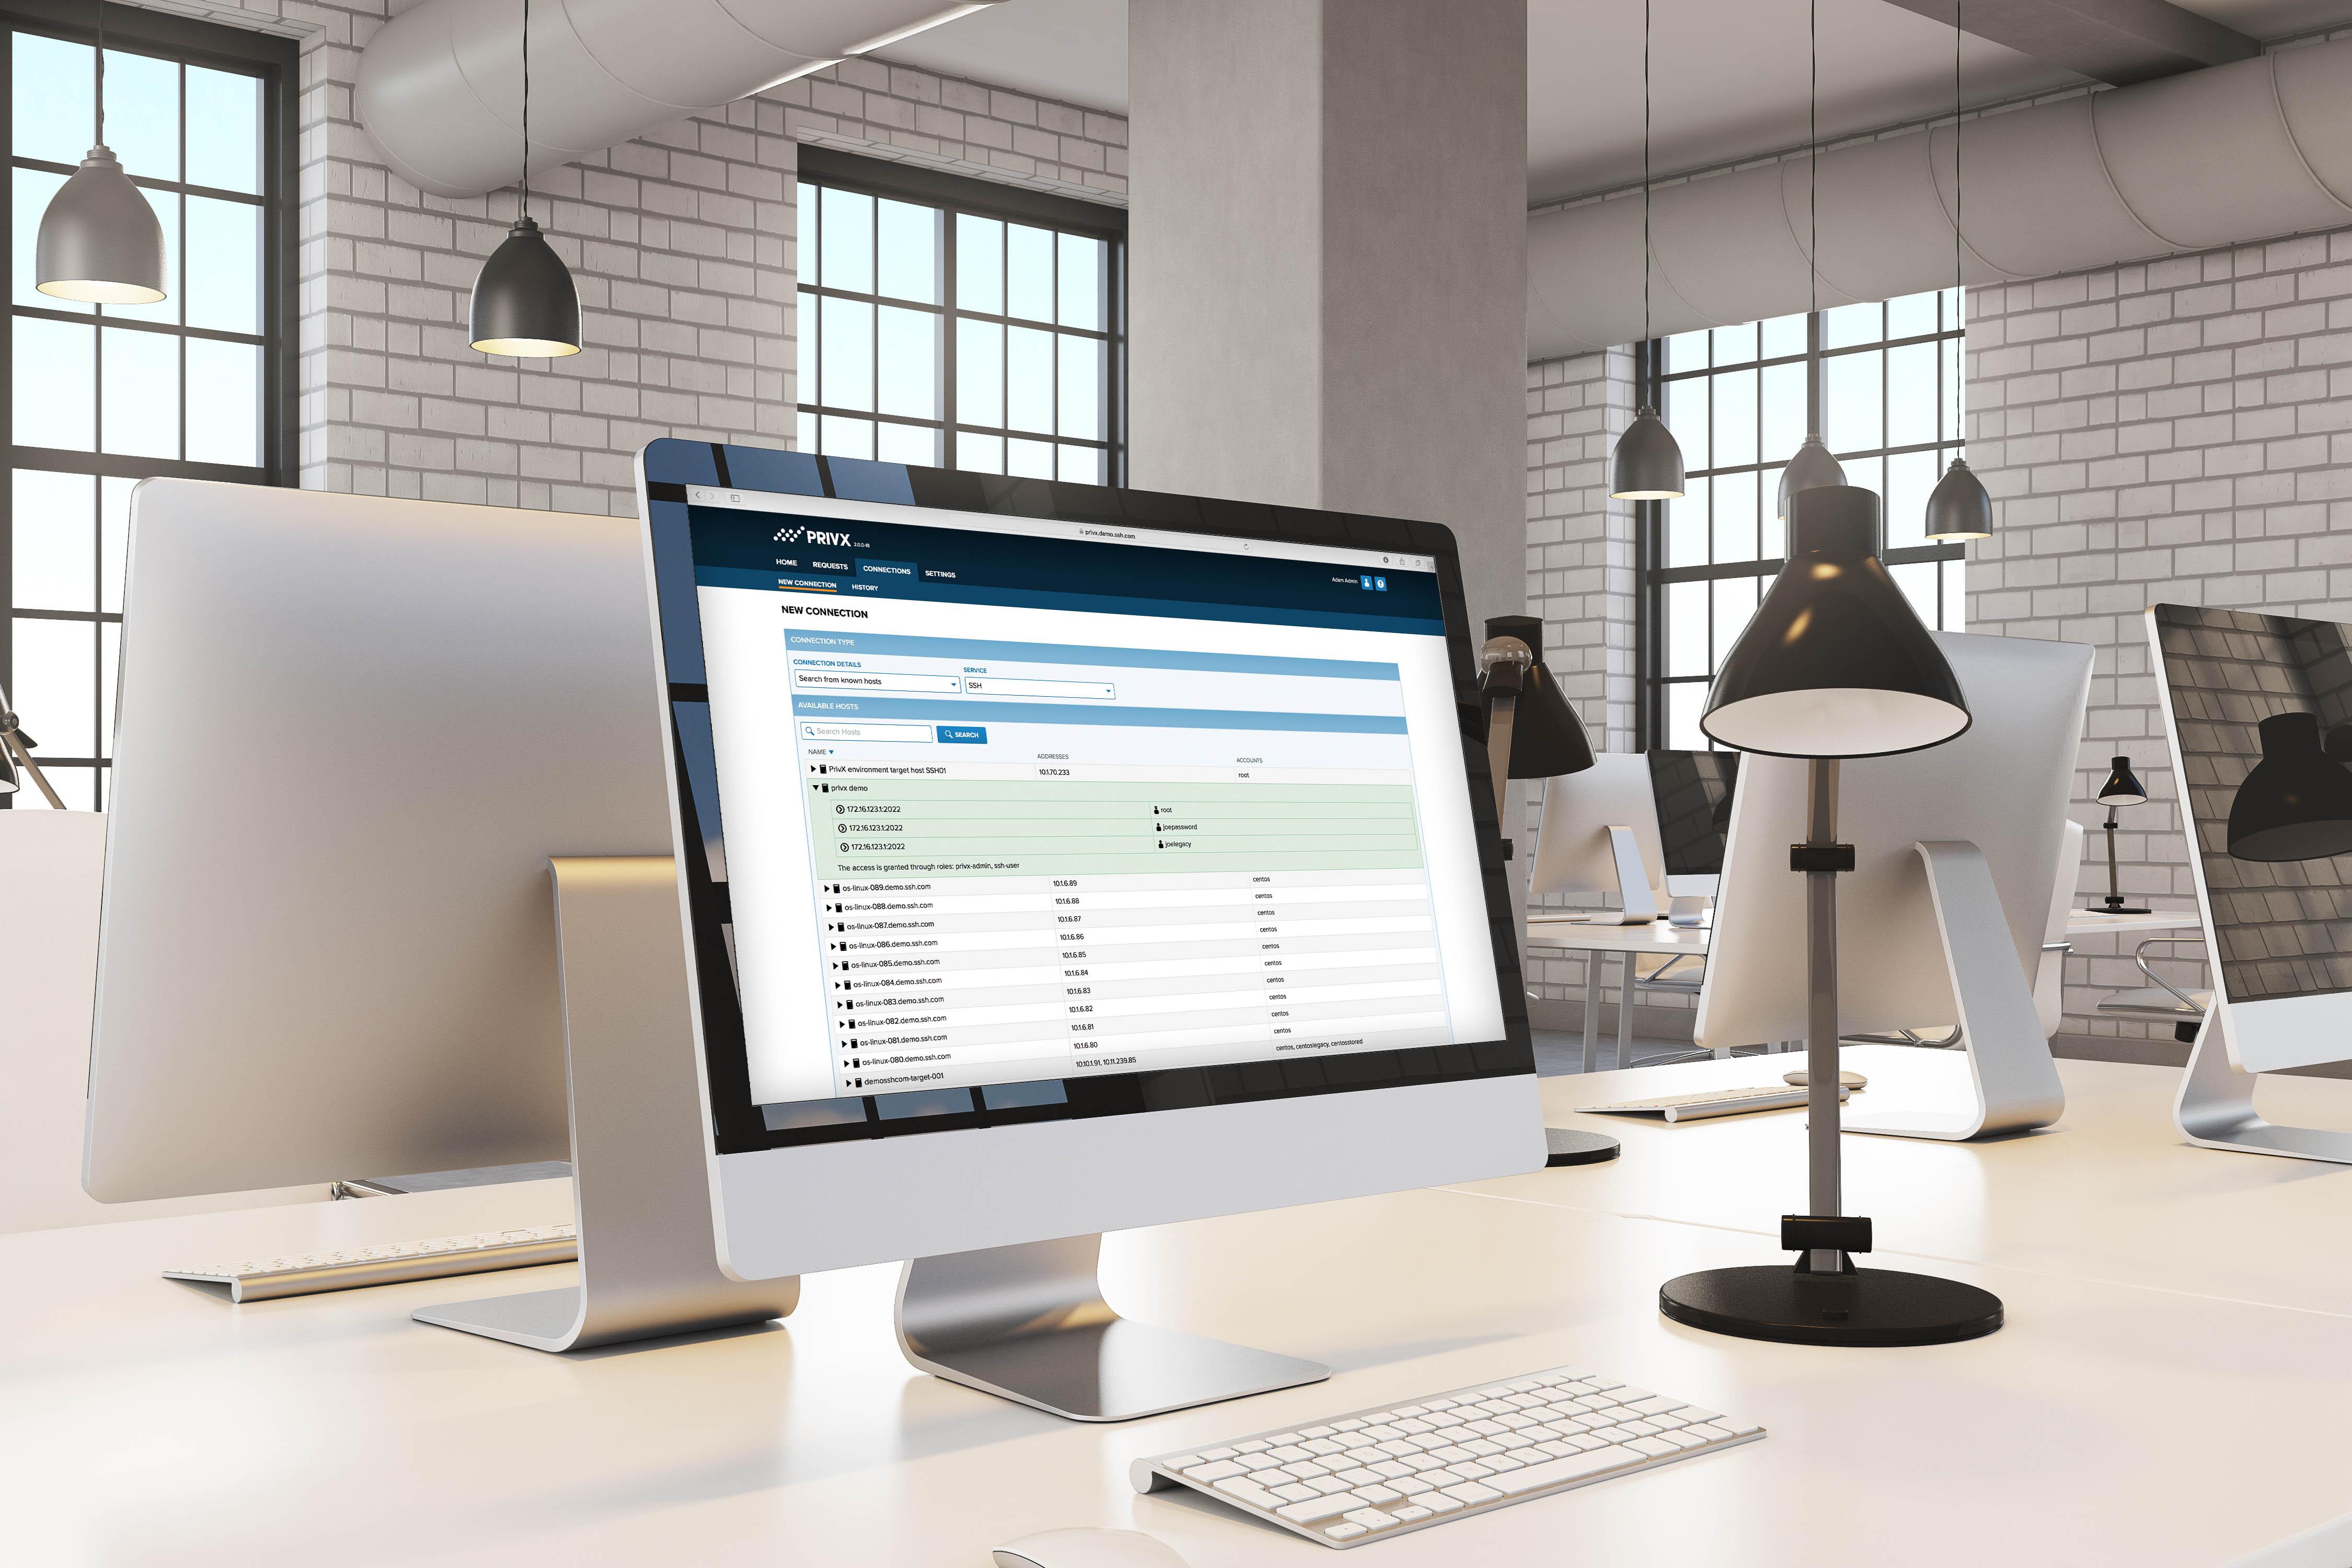 PrivX lean access management is perfect for agile teams